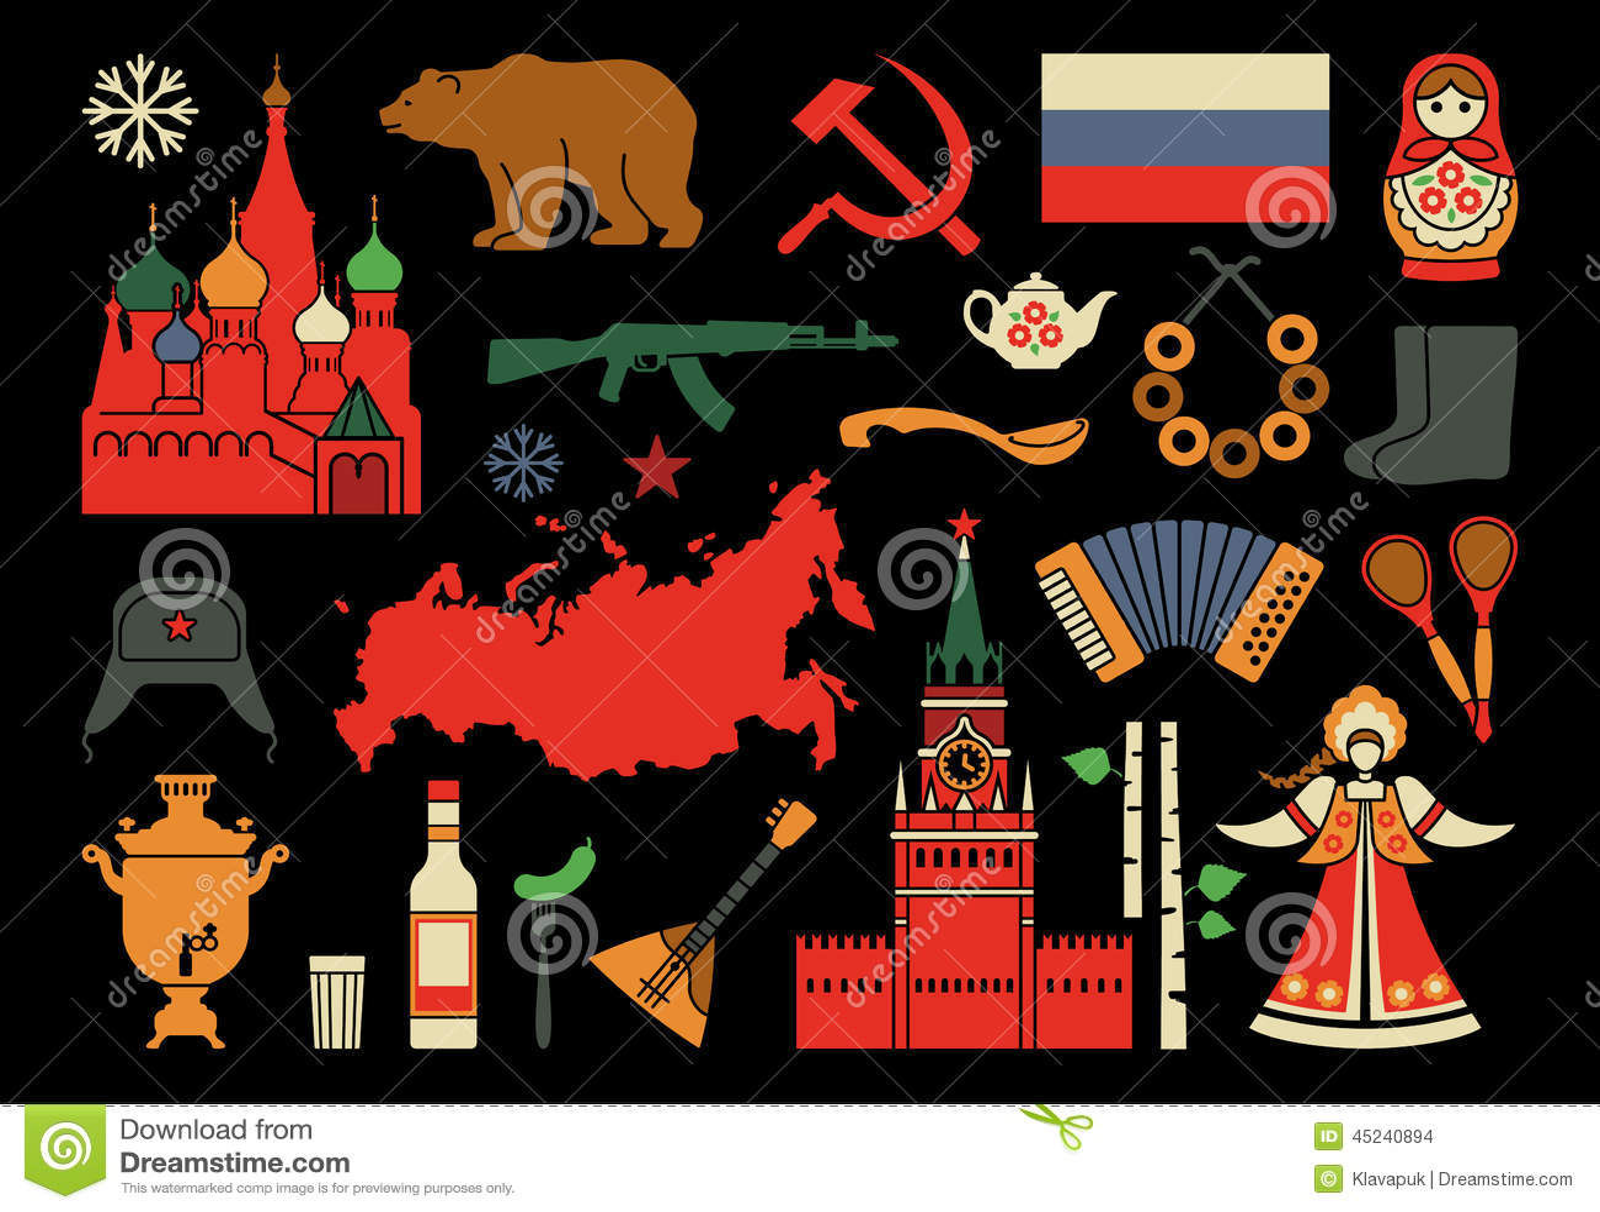 Icônes russes de l'image